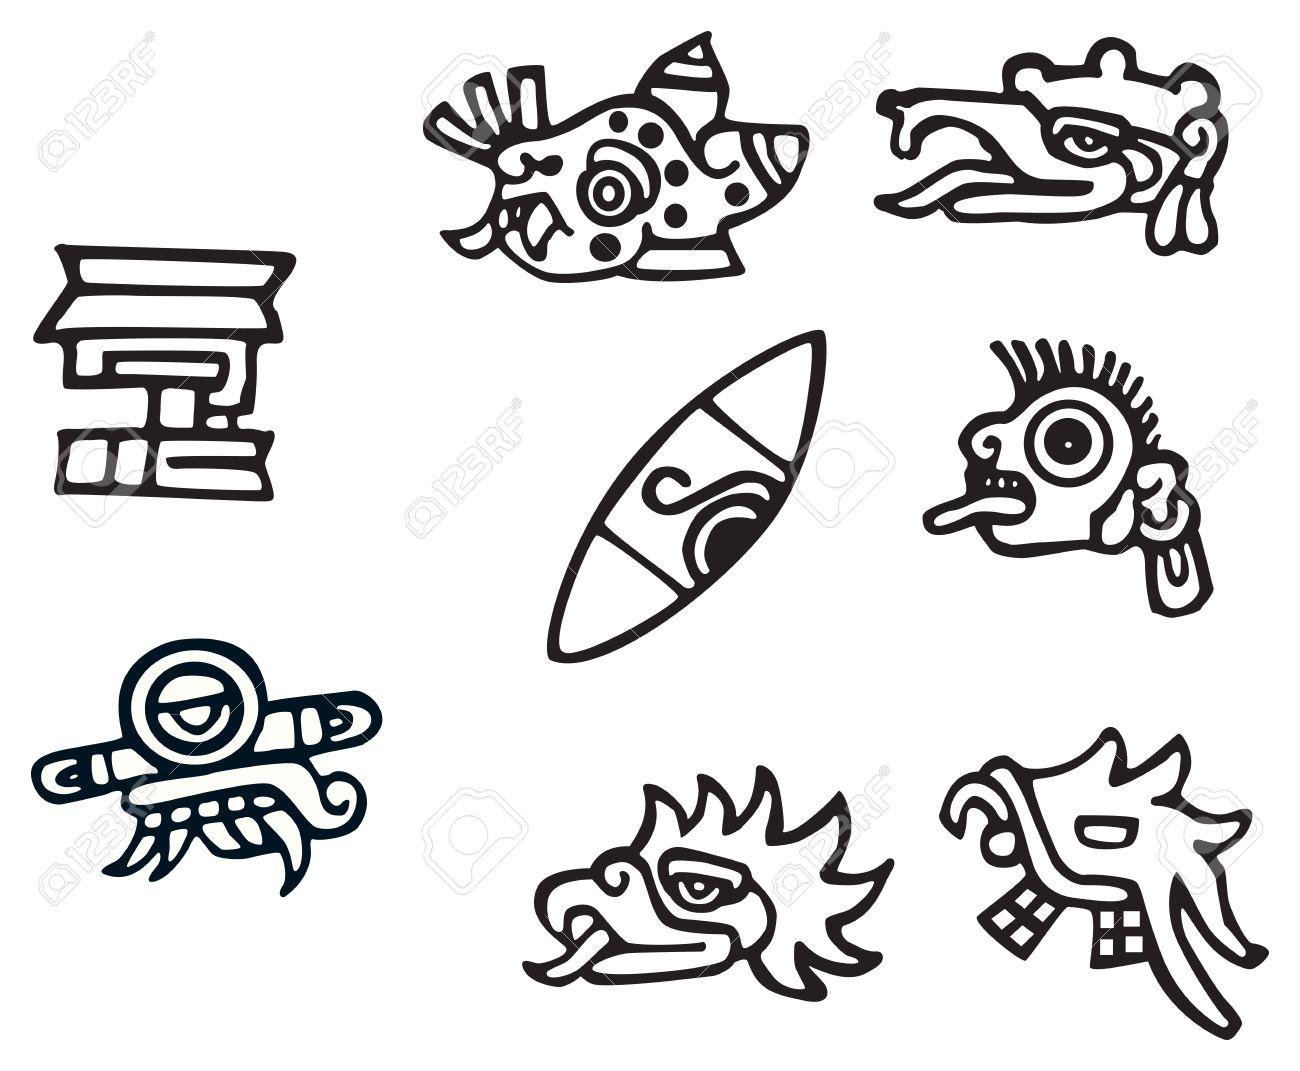 Simbolos Mayas Grandes Ilustraciones Para Los Tatuajes Un Monton - Simbolos-para-tatuaje